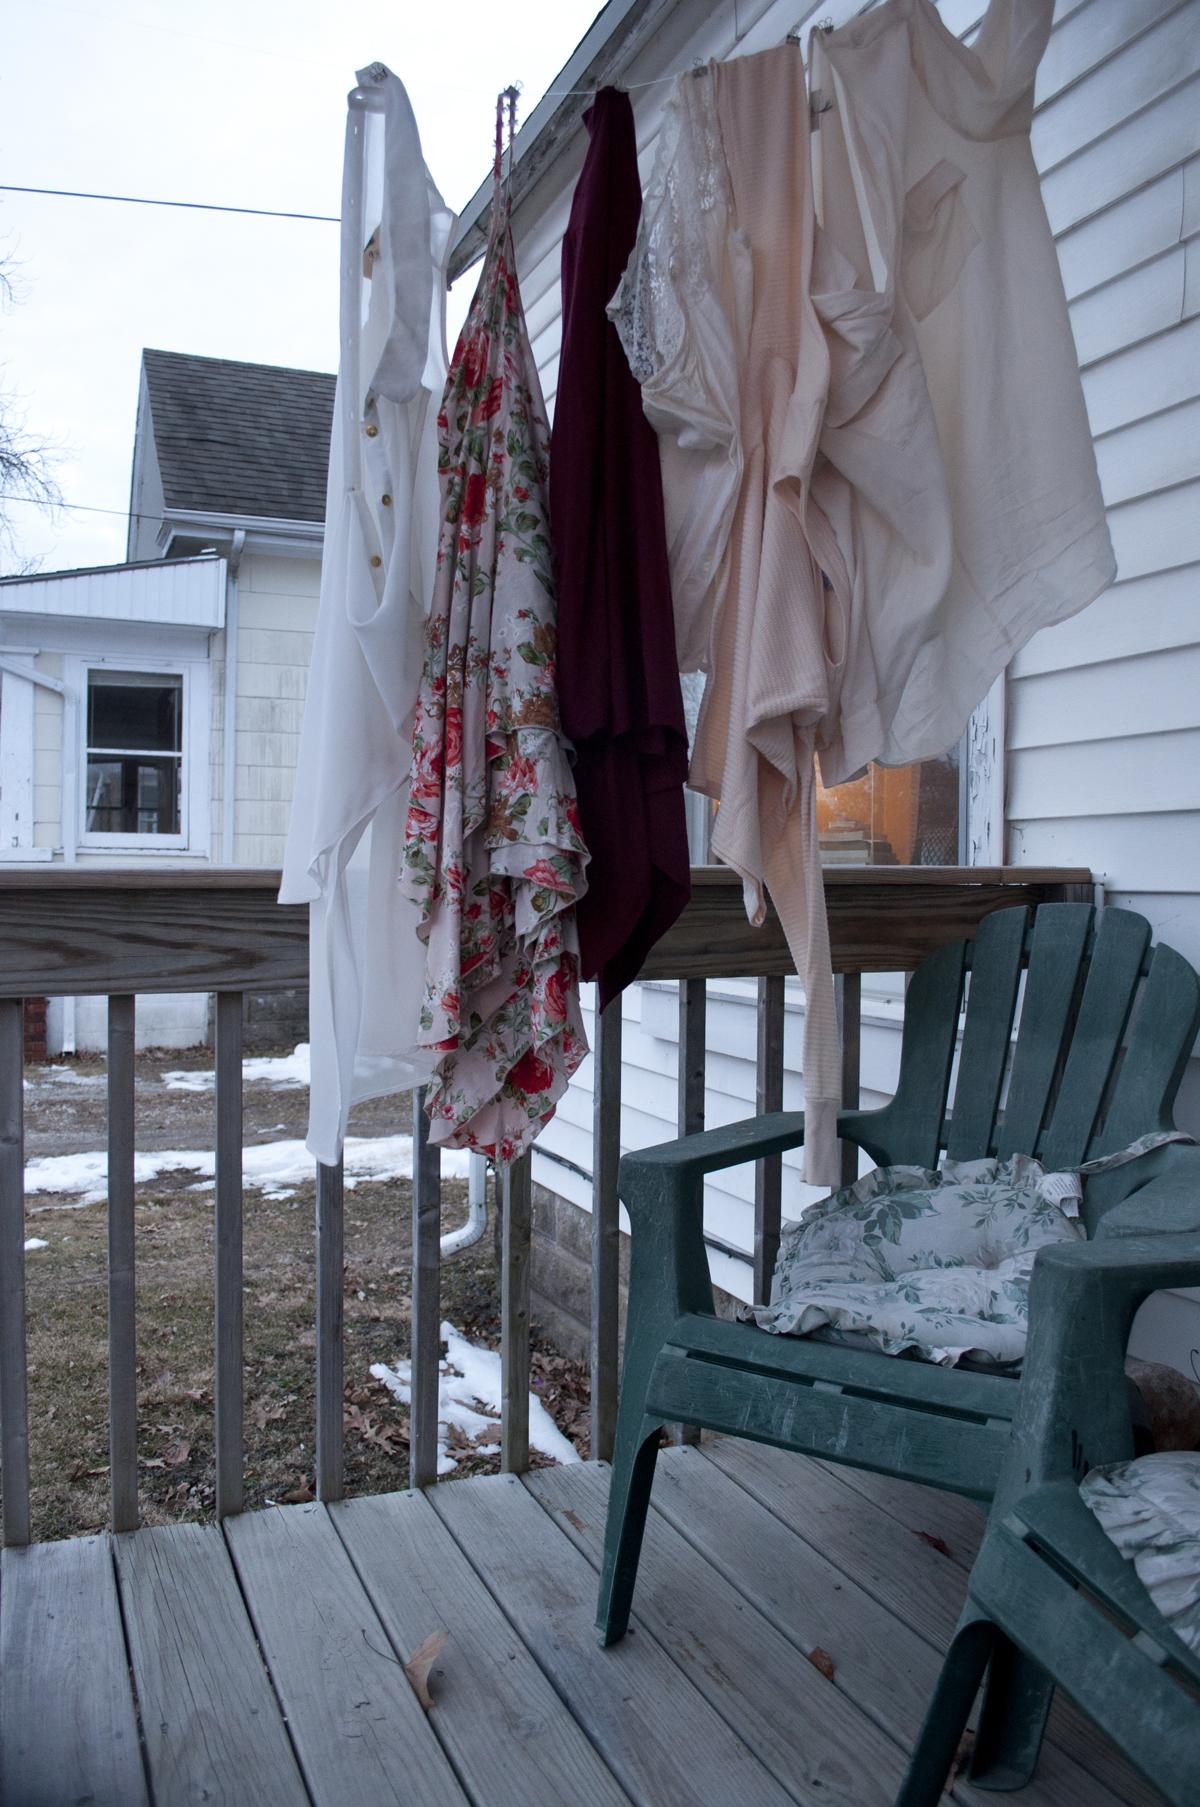 porch_clothesline_small.jpg